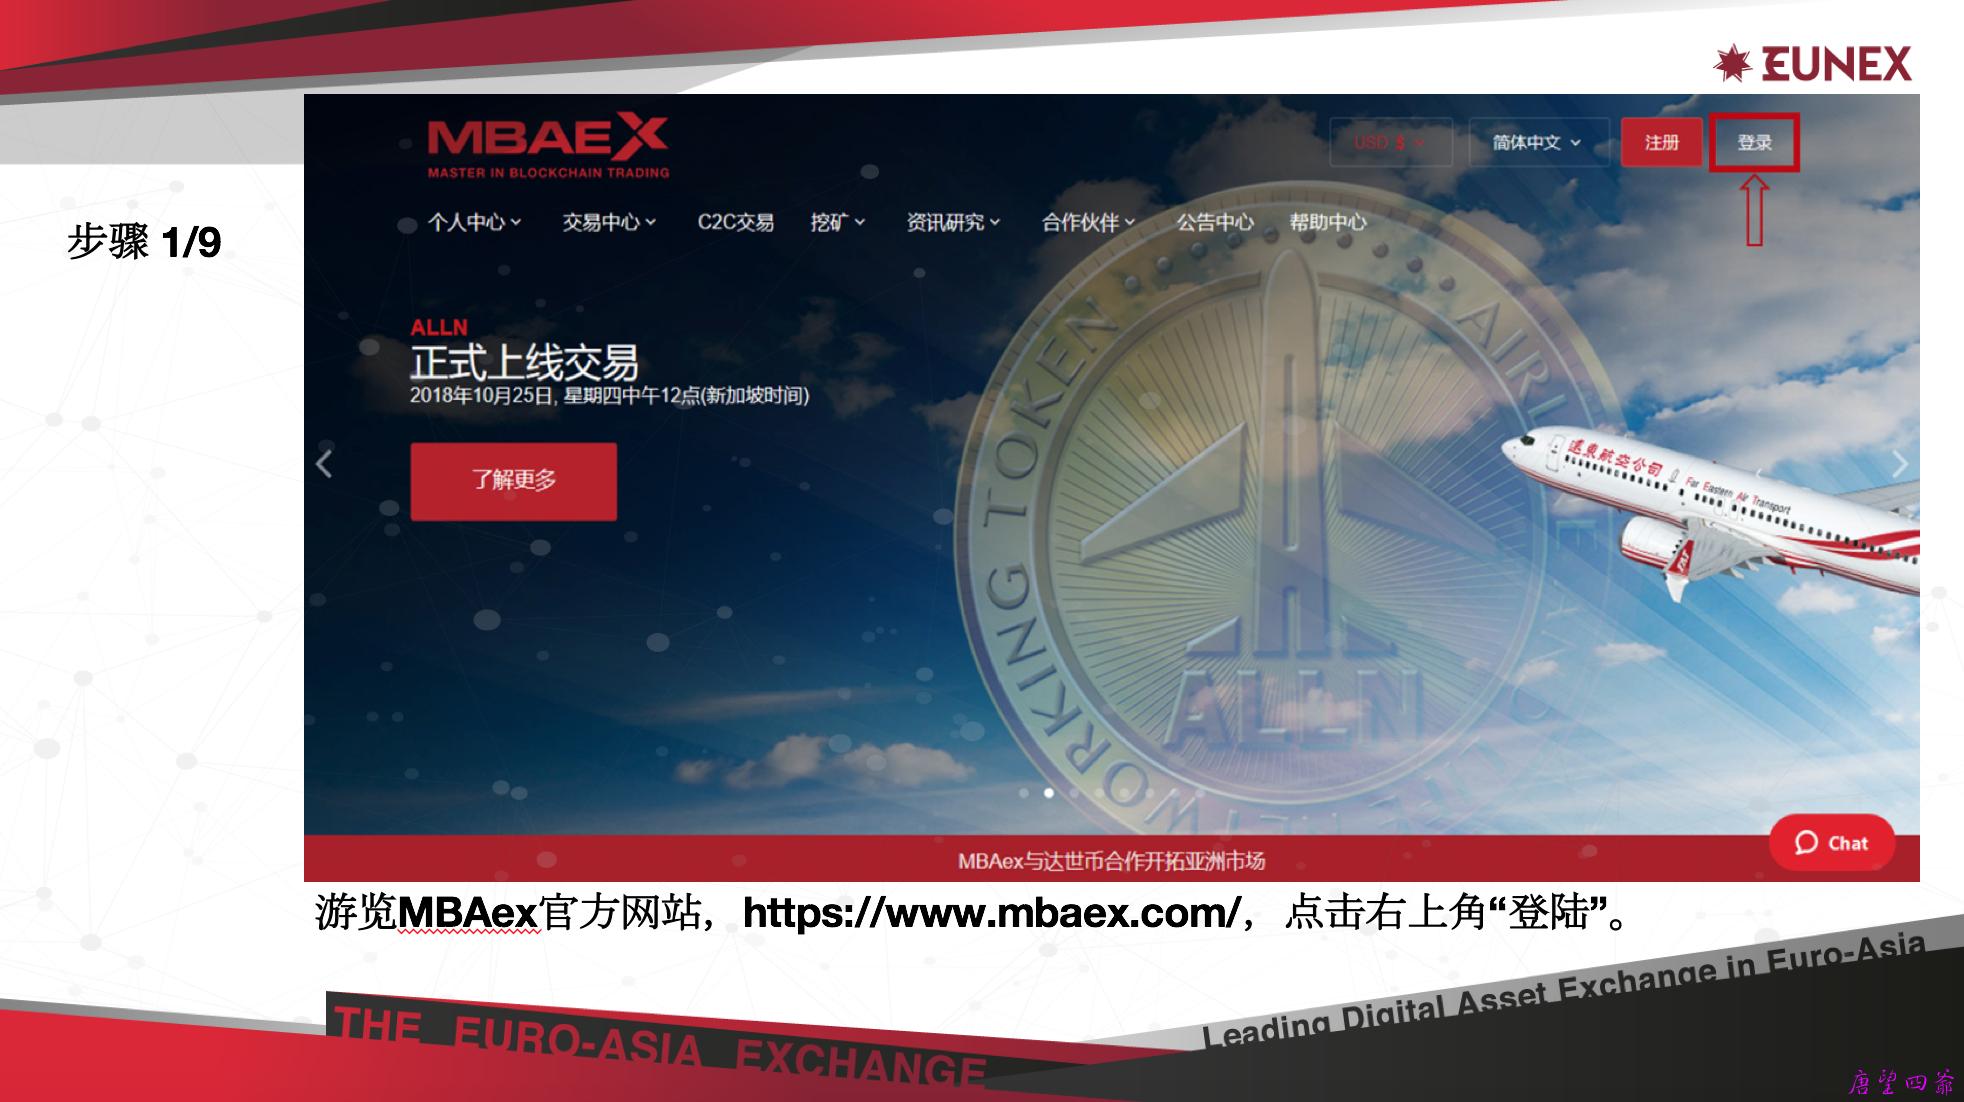 MBAEX转账WCG华克金至EUNEX欧联的图文教程